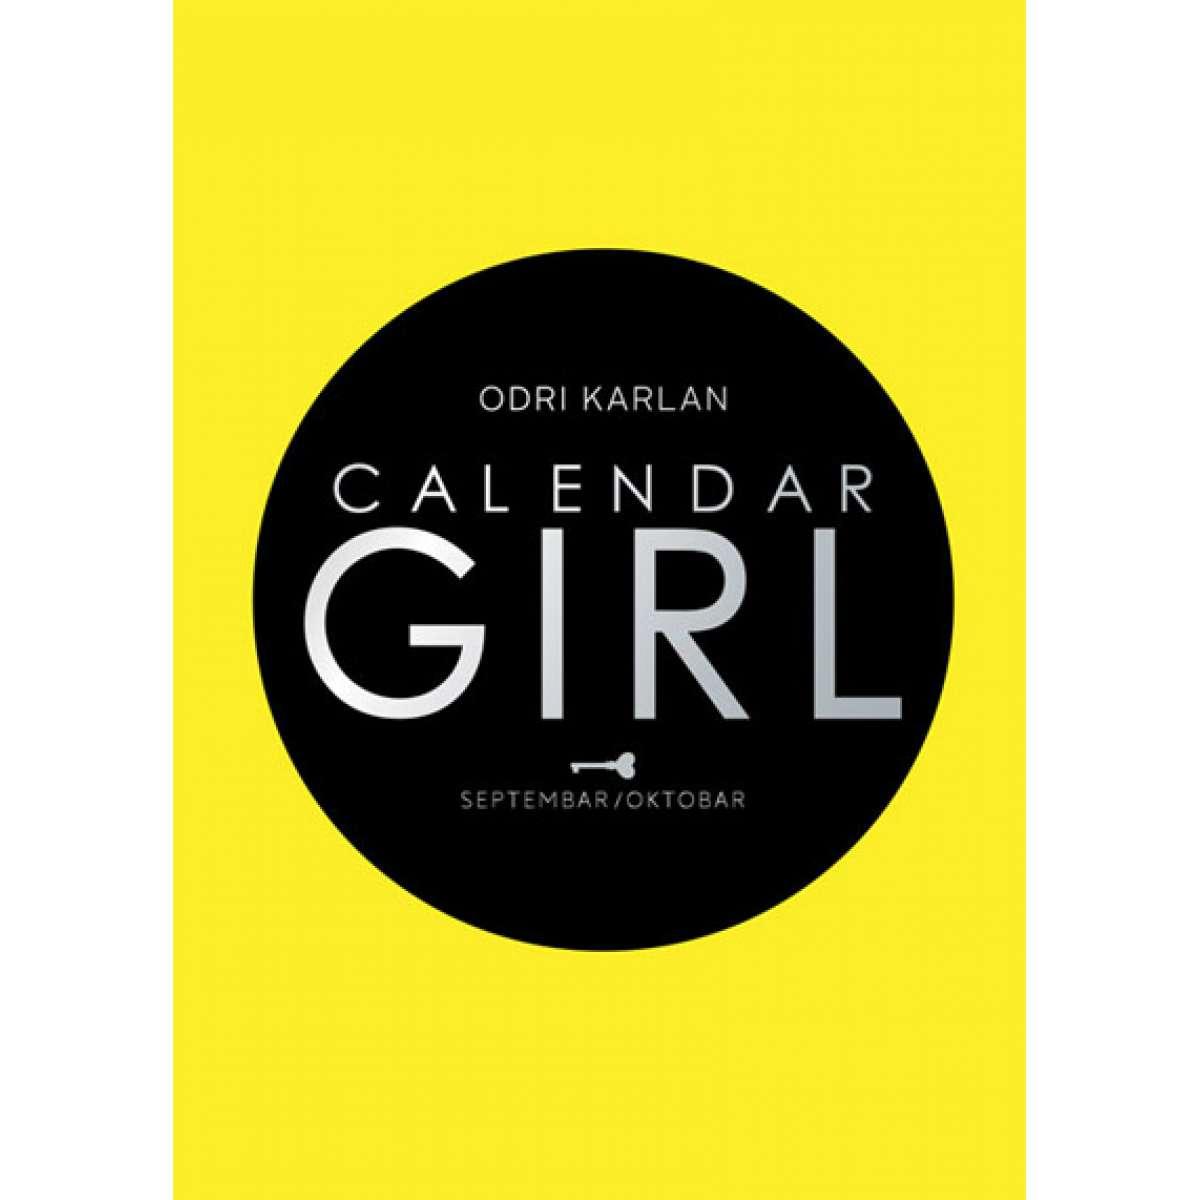 CALENDAR GIRL: SEPTEMBAR/OKTOBAR